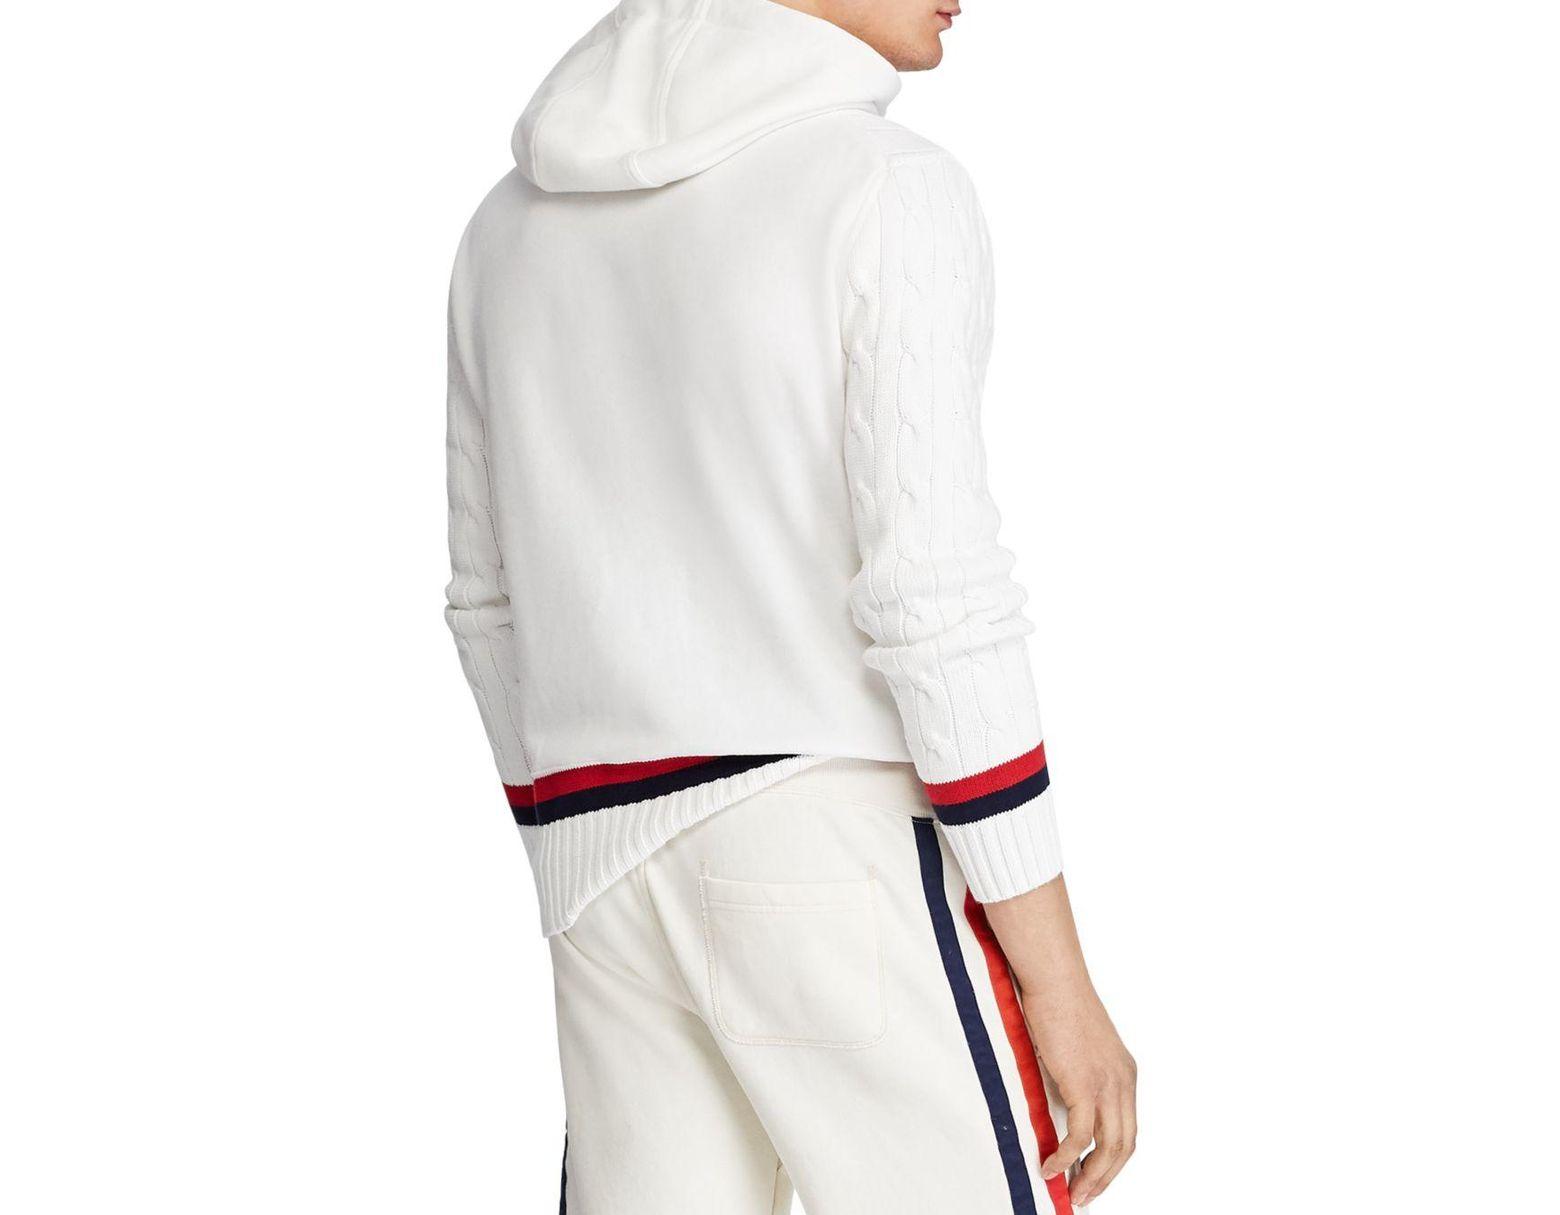 7a27e2d995 Polo Ralph Lauren Cricket Hybrid Hooded Sweater in White for Men - Lyst